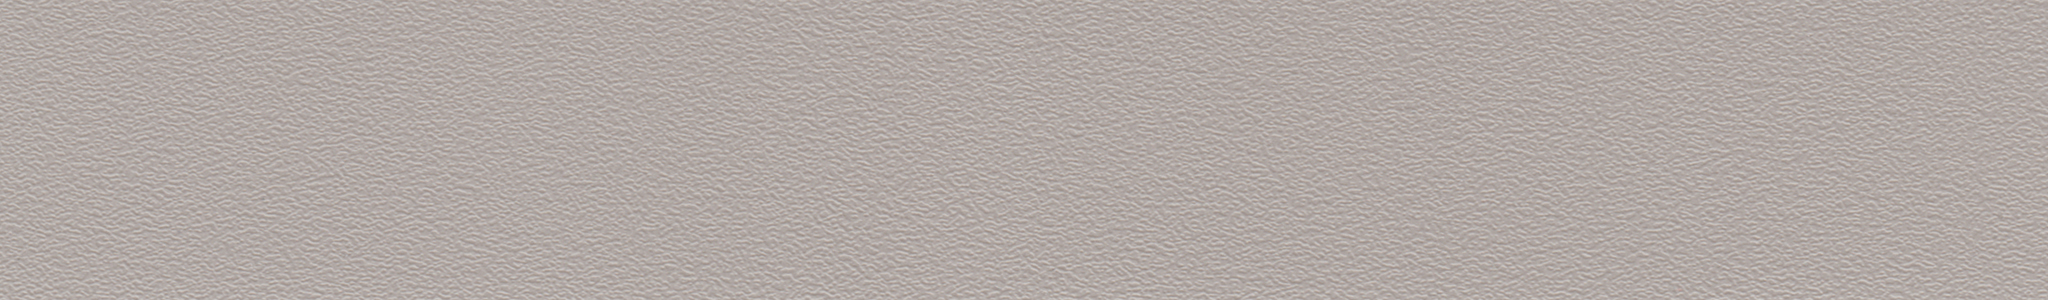 HU 176002 Кромка ABS Конго Серый - Шагрень XG